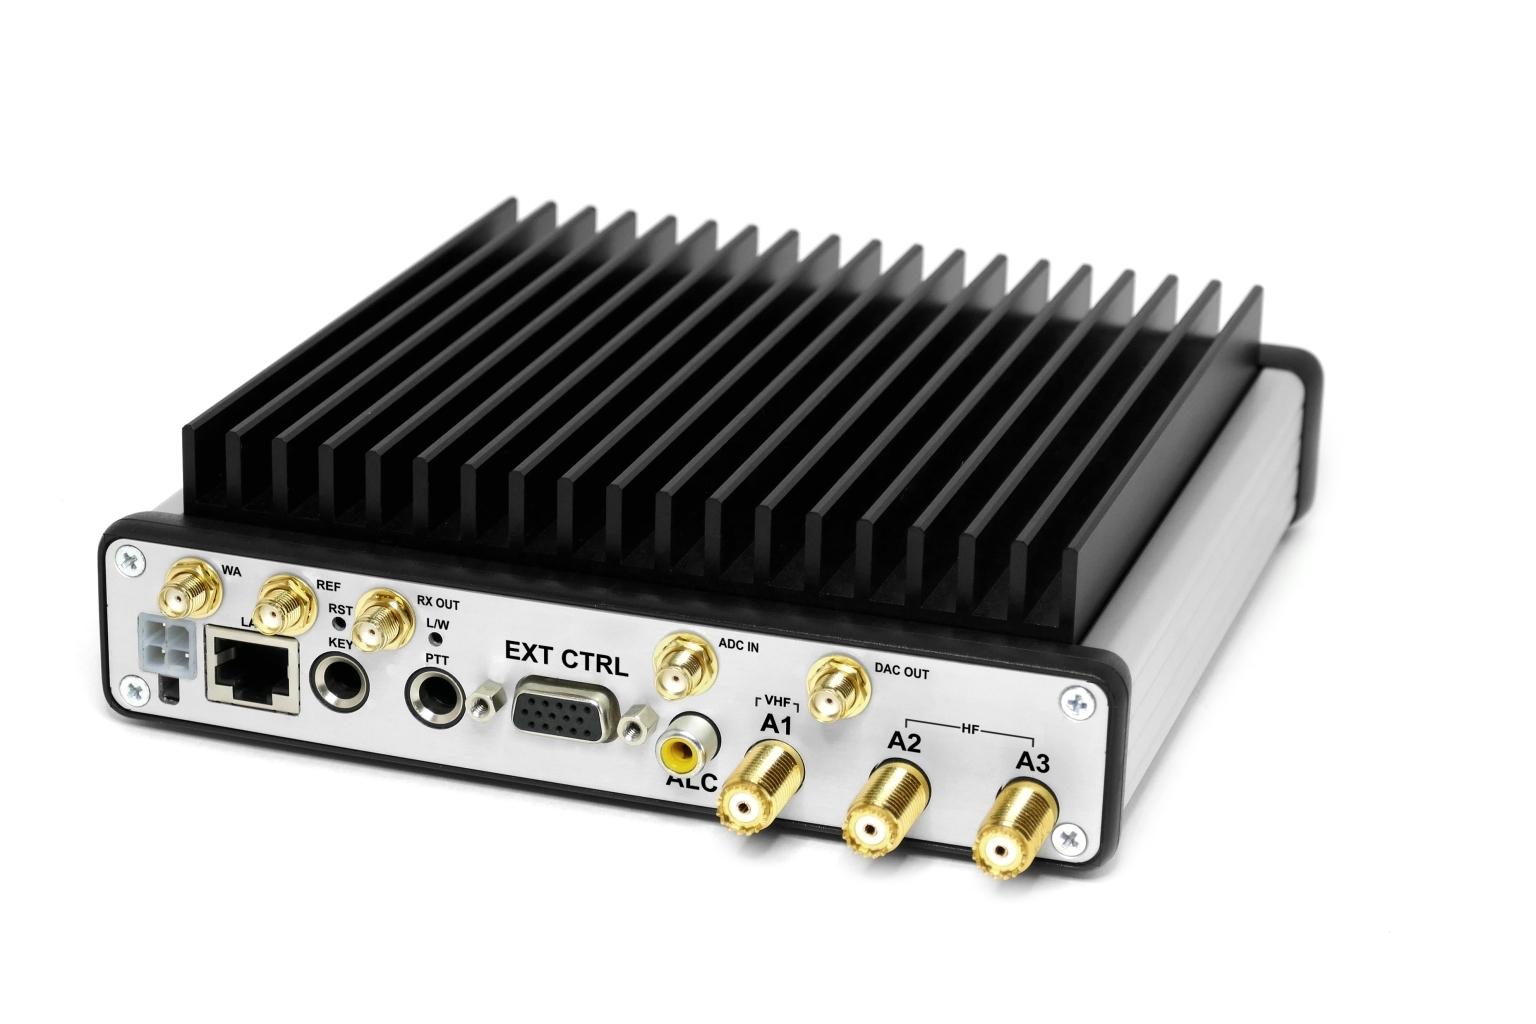 SunSDR2-Pro back